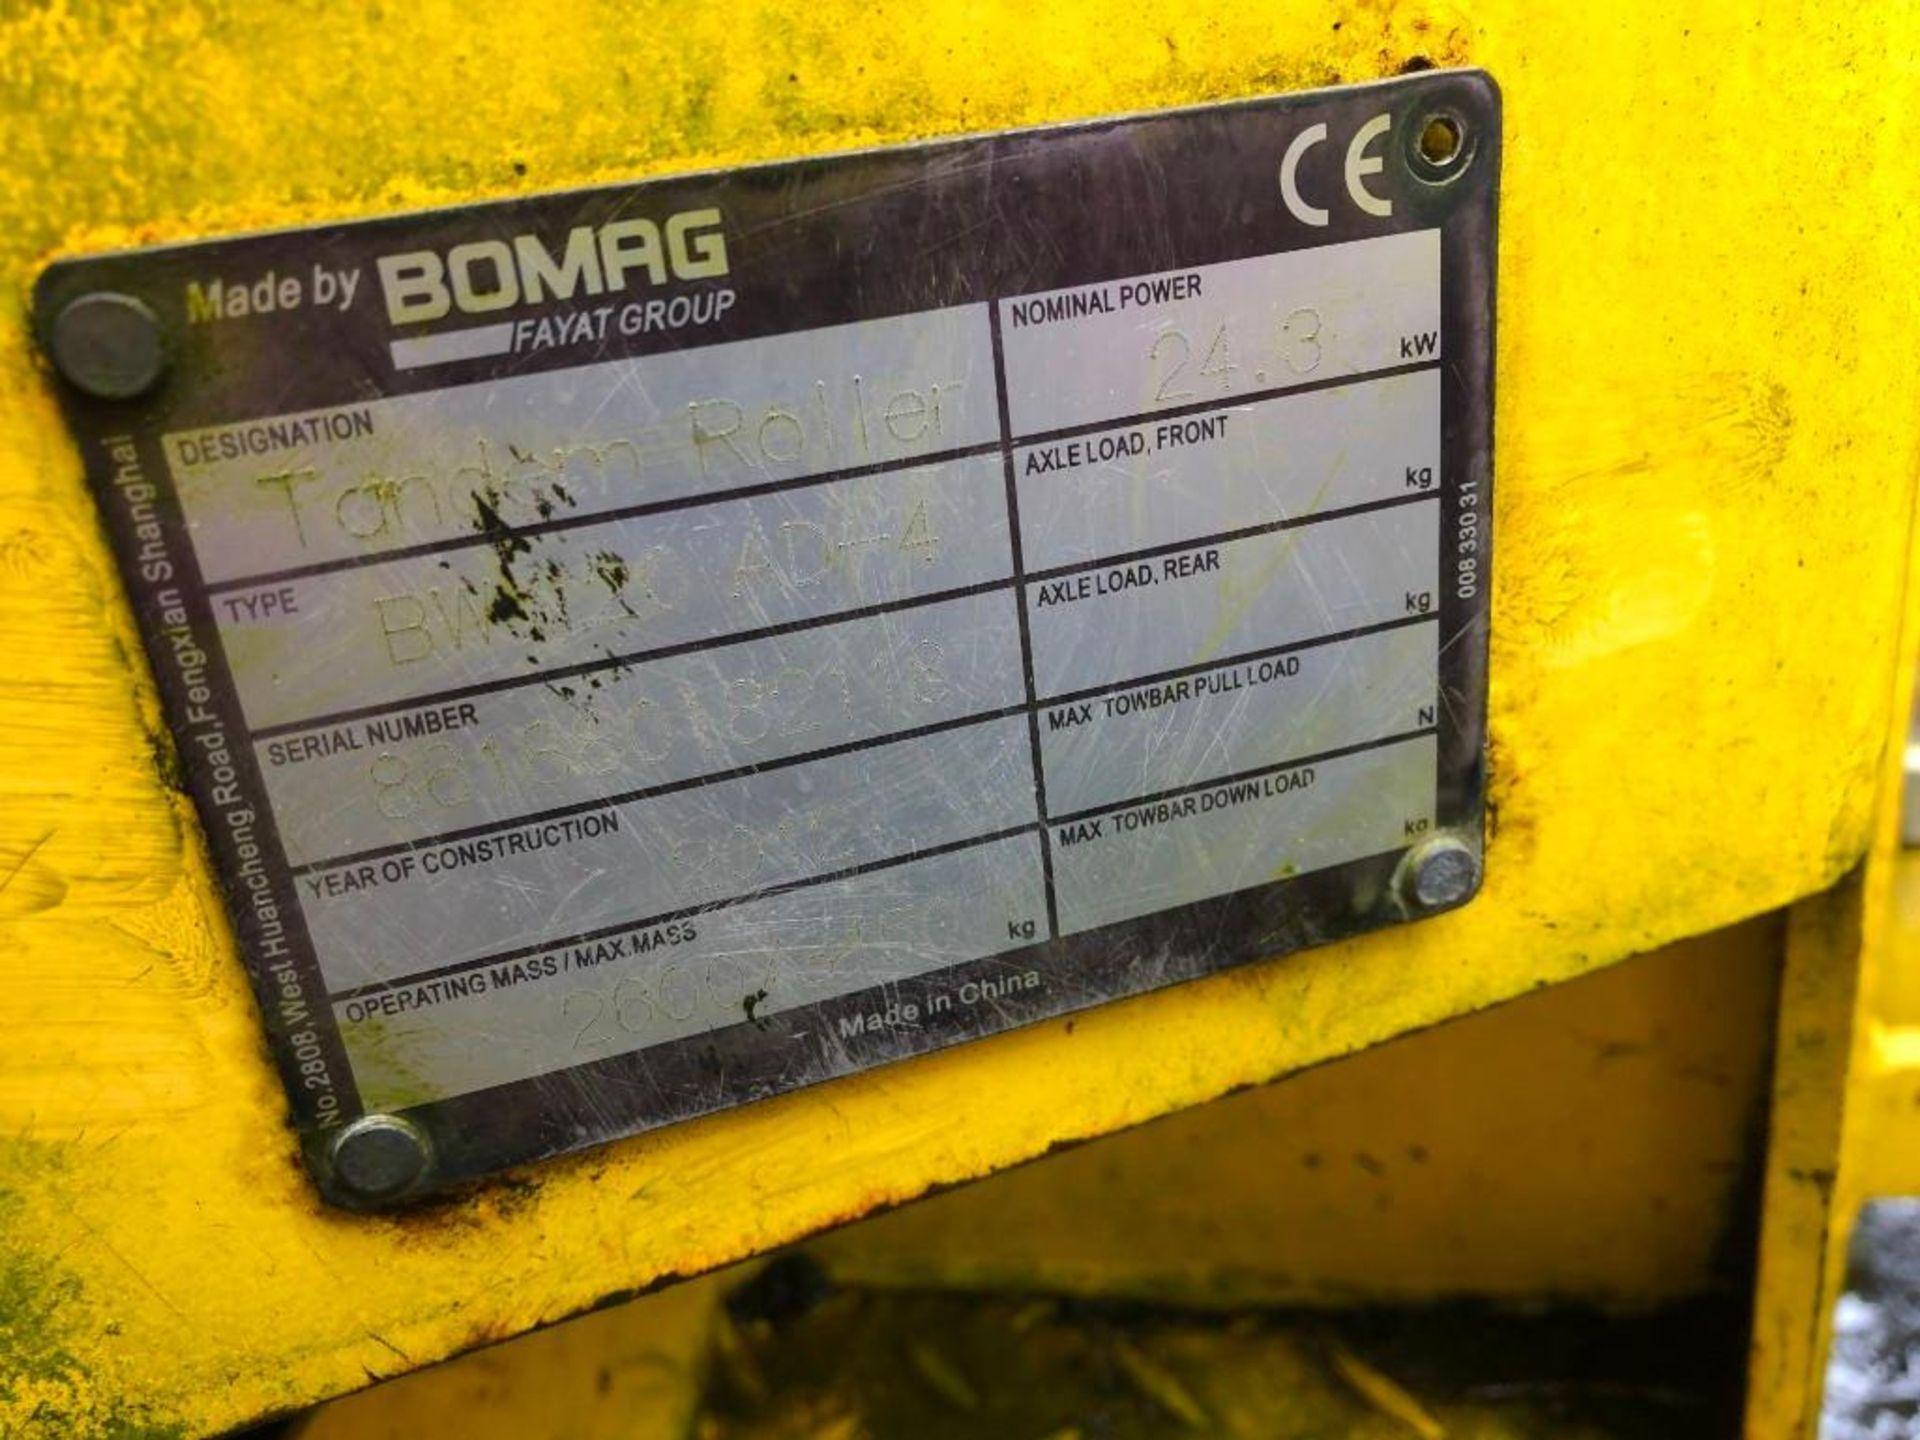 2012 BOMAG BW120 AD-1 TANDEM VIBRATORY ROLLER (UNIT #JB-218) - Image 3 of 4